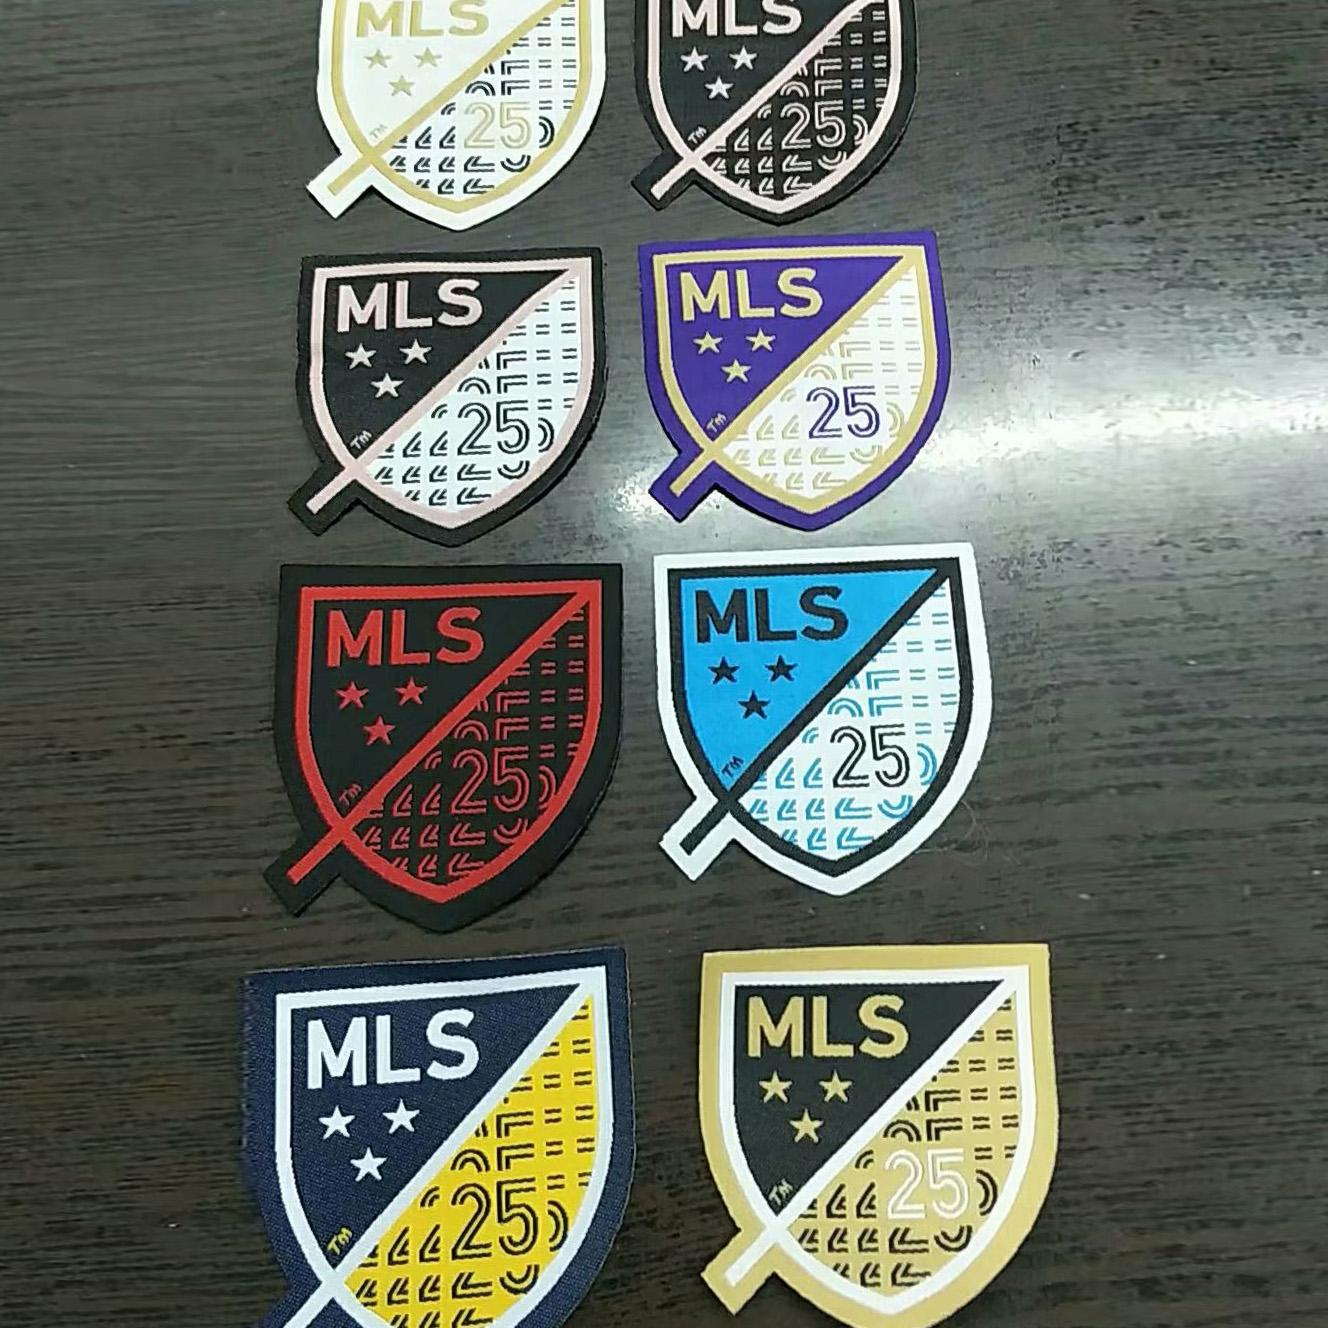 Futbol Futbol Yamalar Değil ayrı satılır